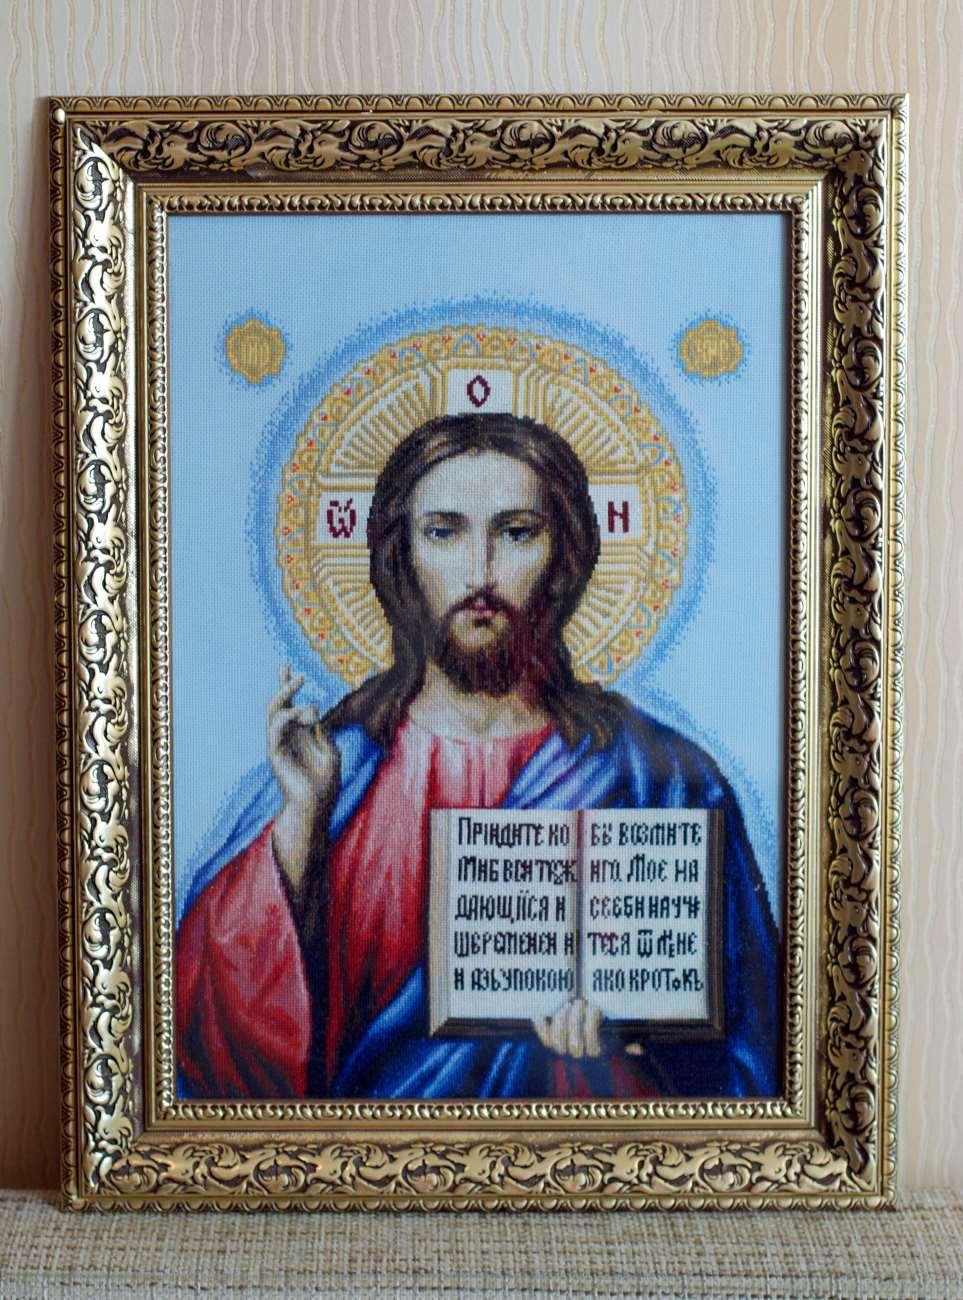 Иисус Христос, Lica-S